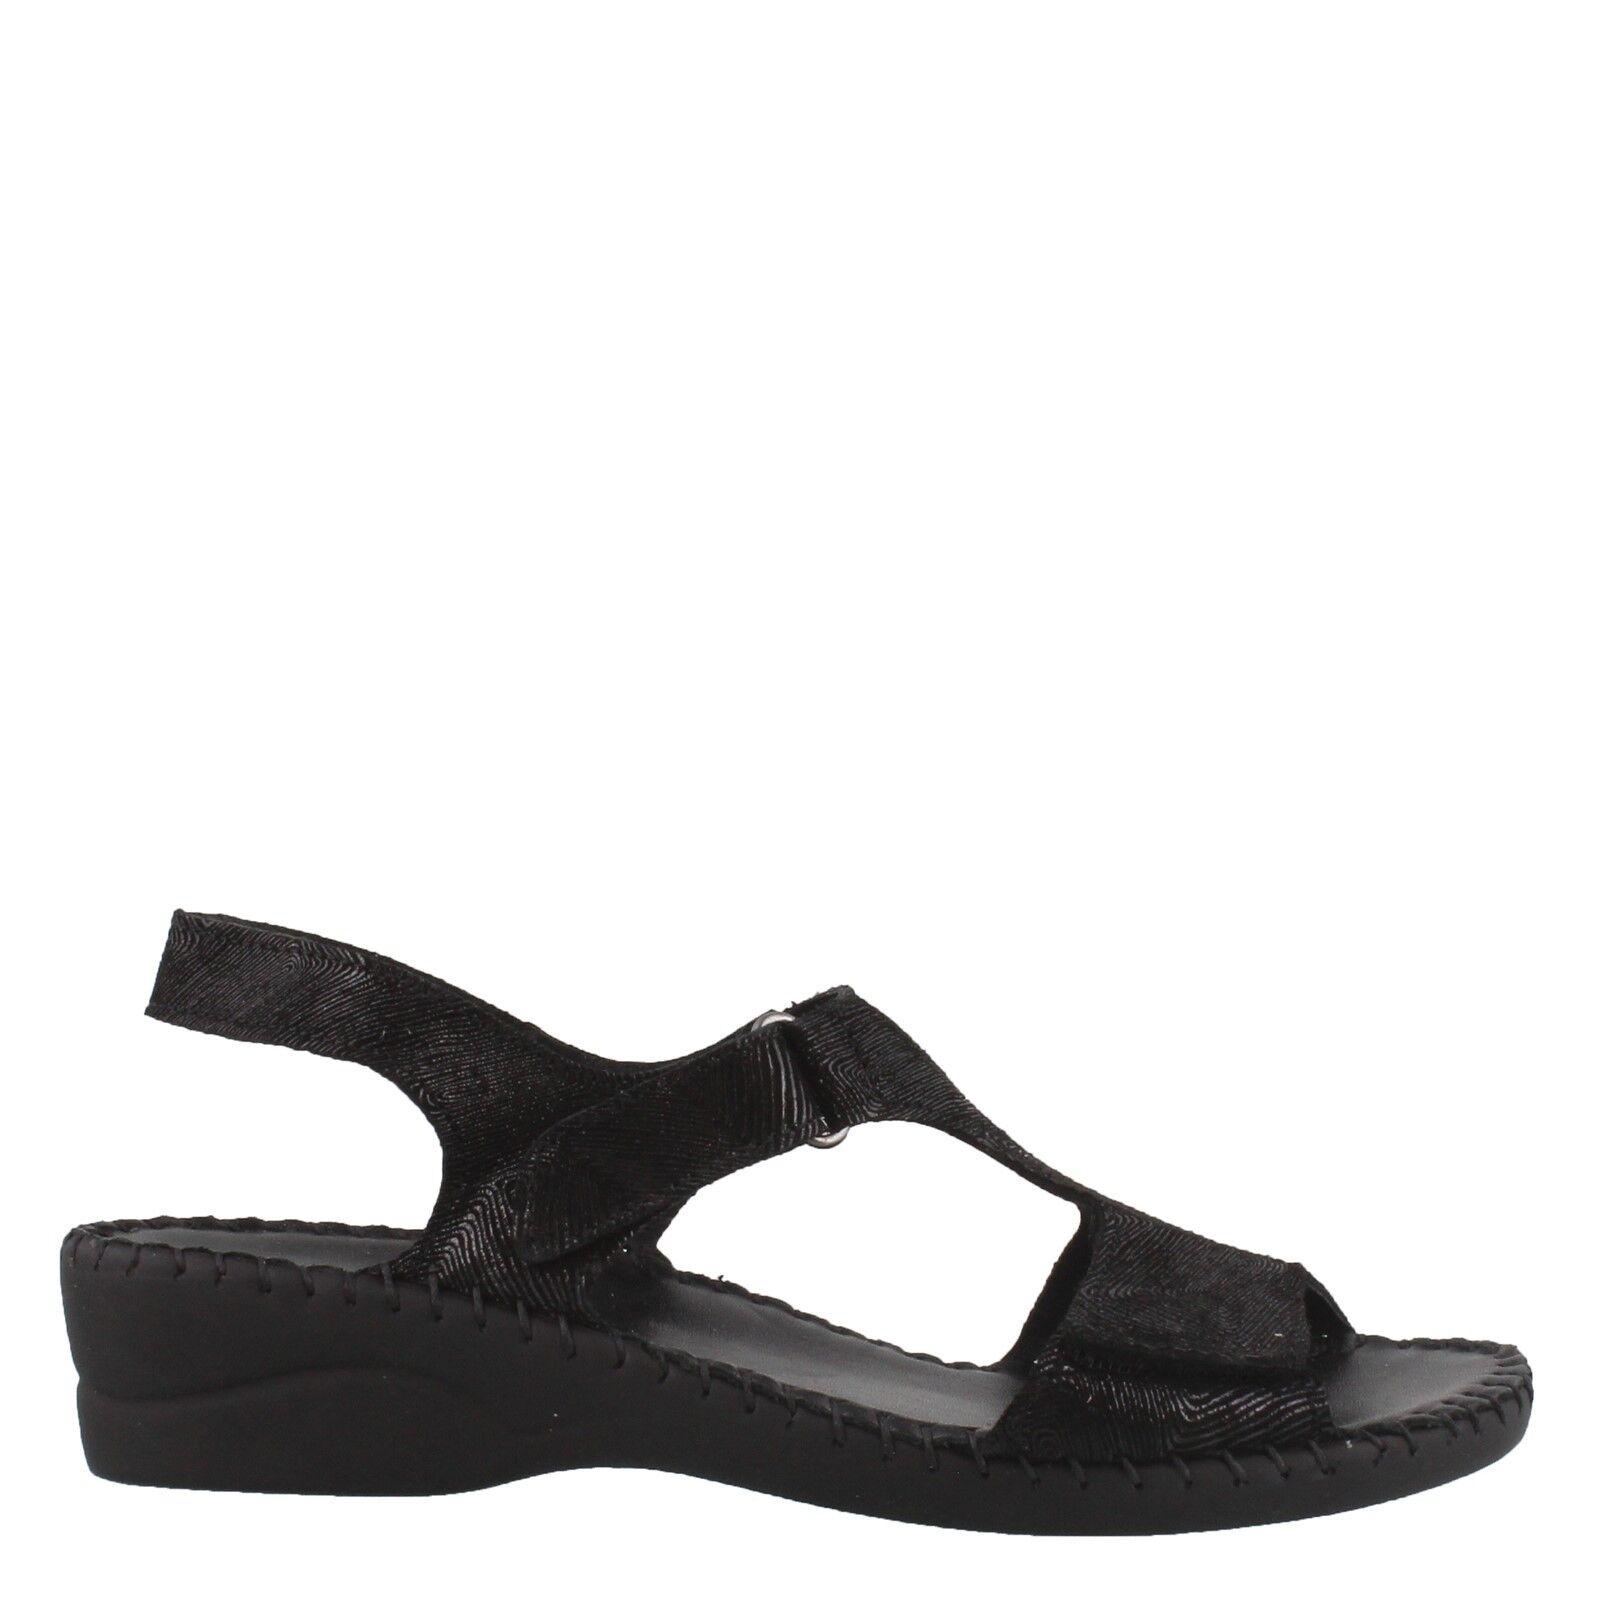 La Plume Expo Women's Black print Leather wedge sandal adjustable Straps size 39